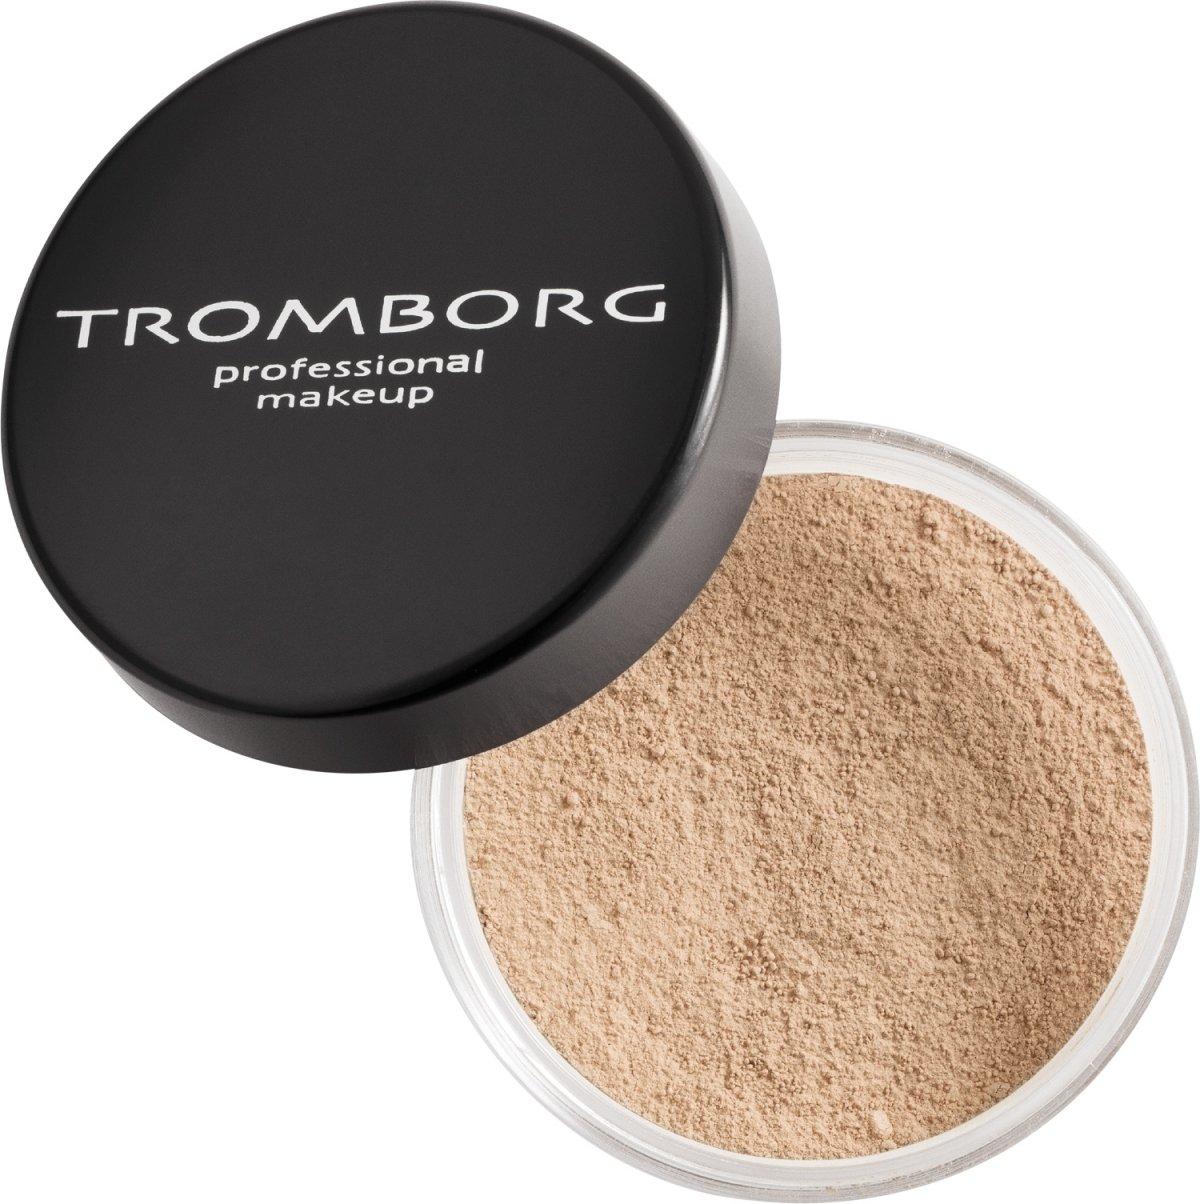 tromborg mineral foundation